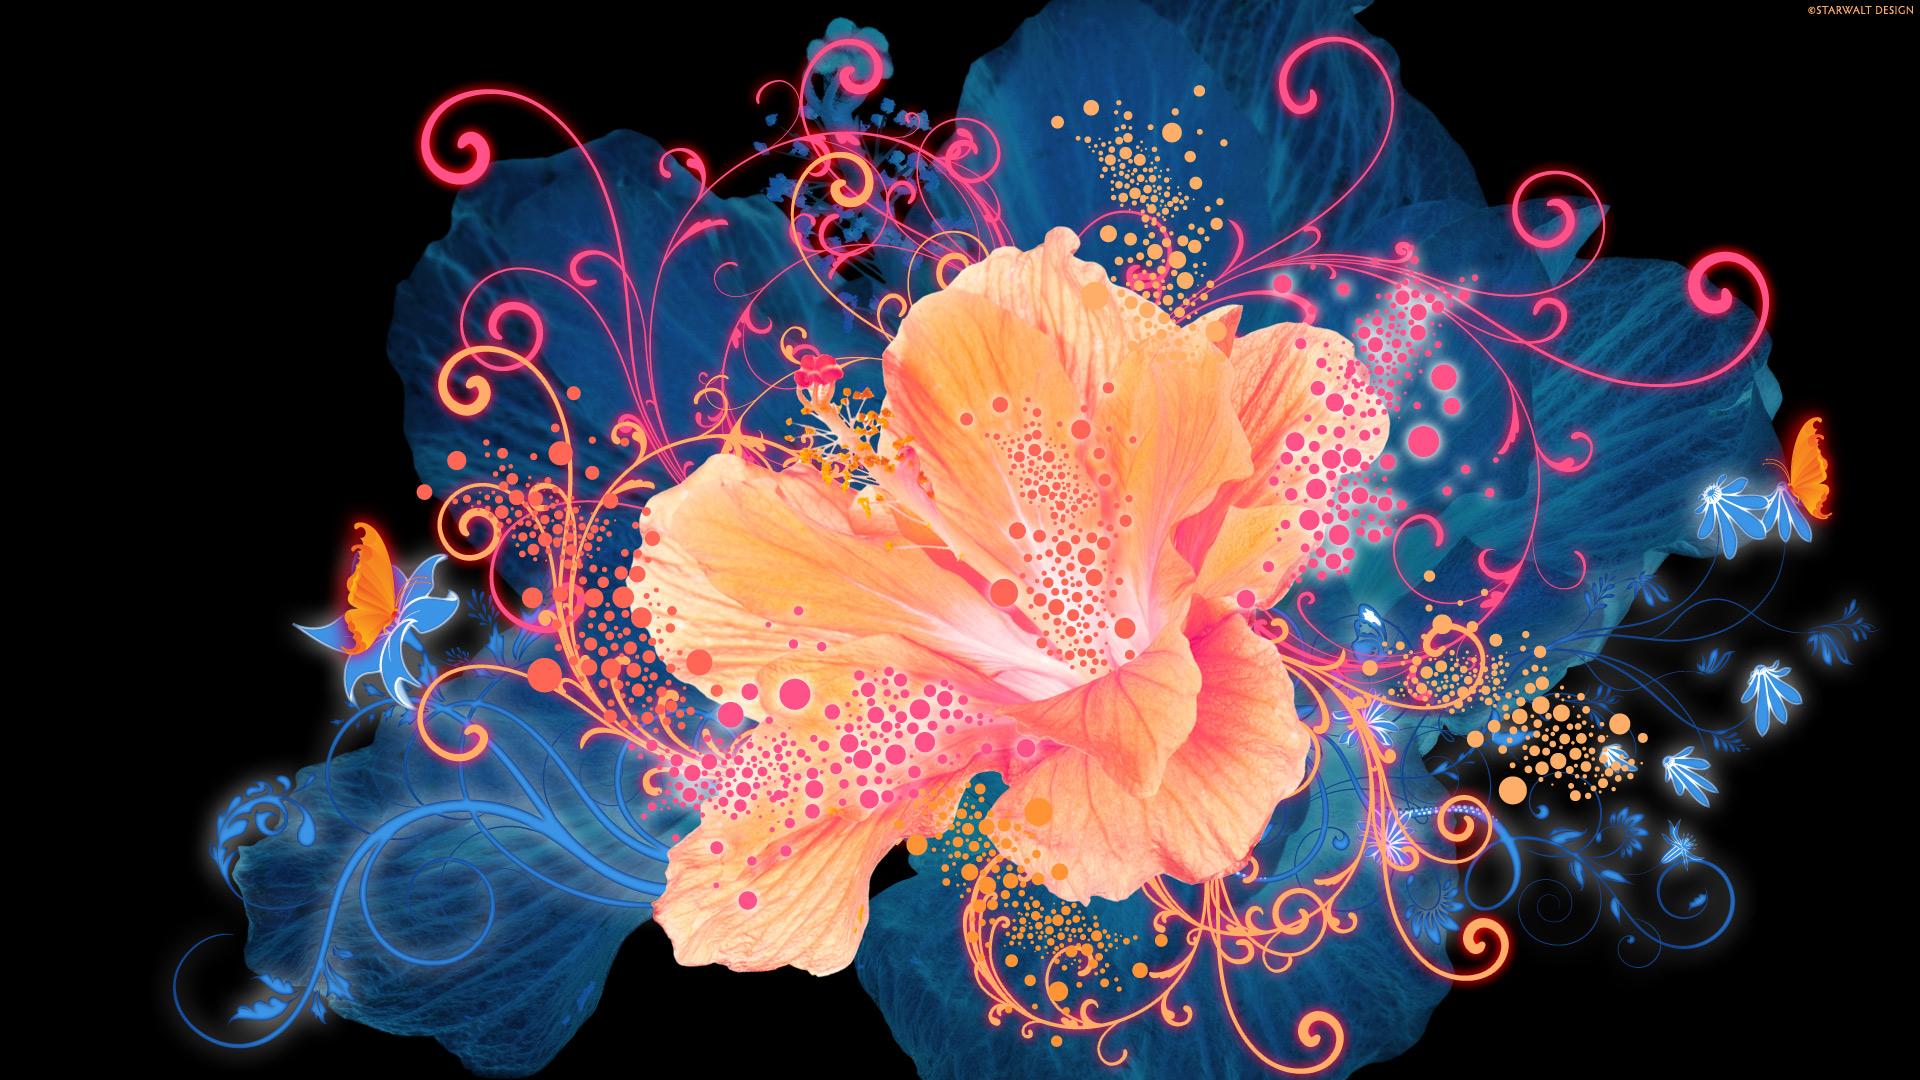 images 3d graphics flowers 1920x1080